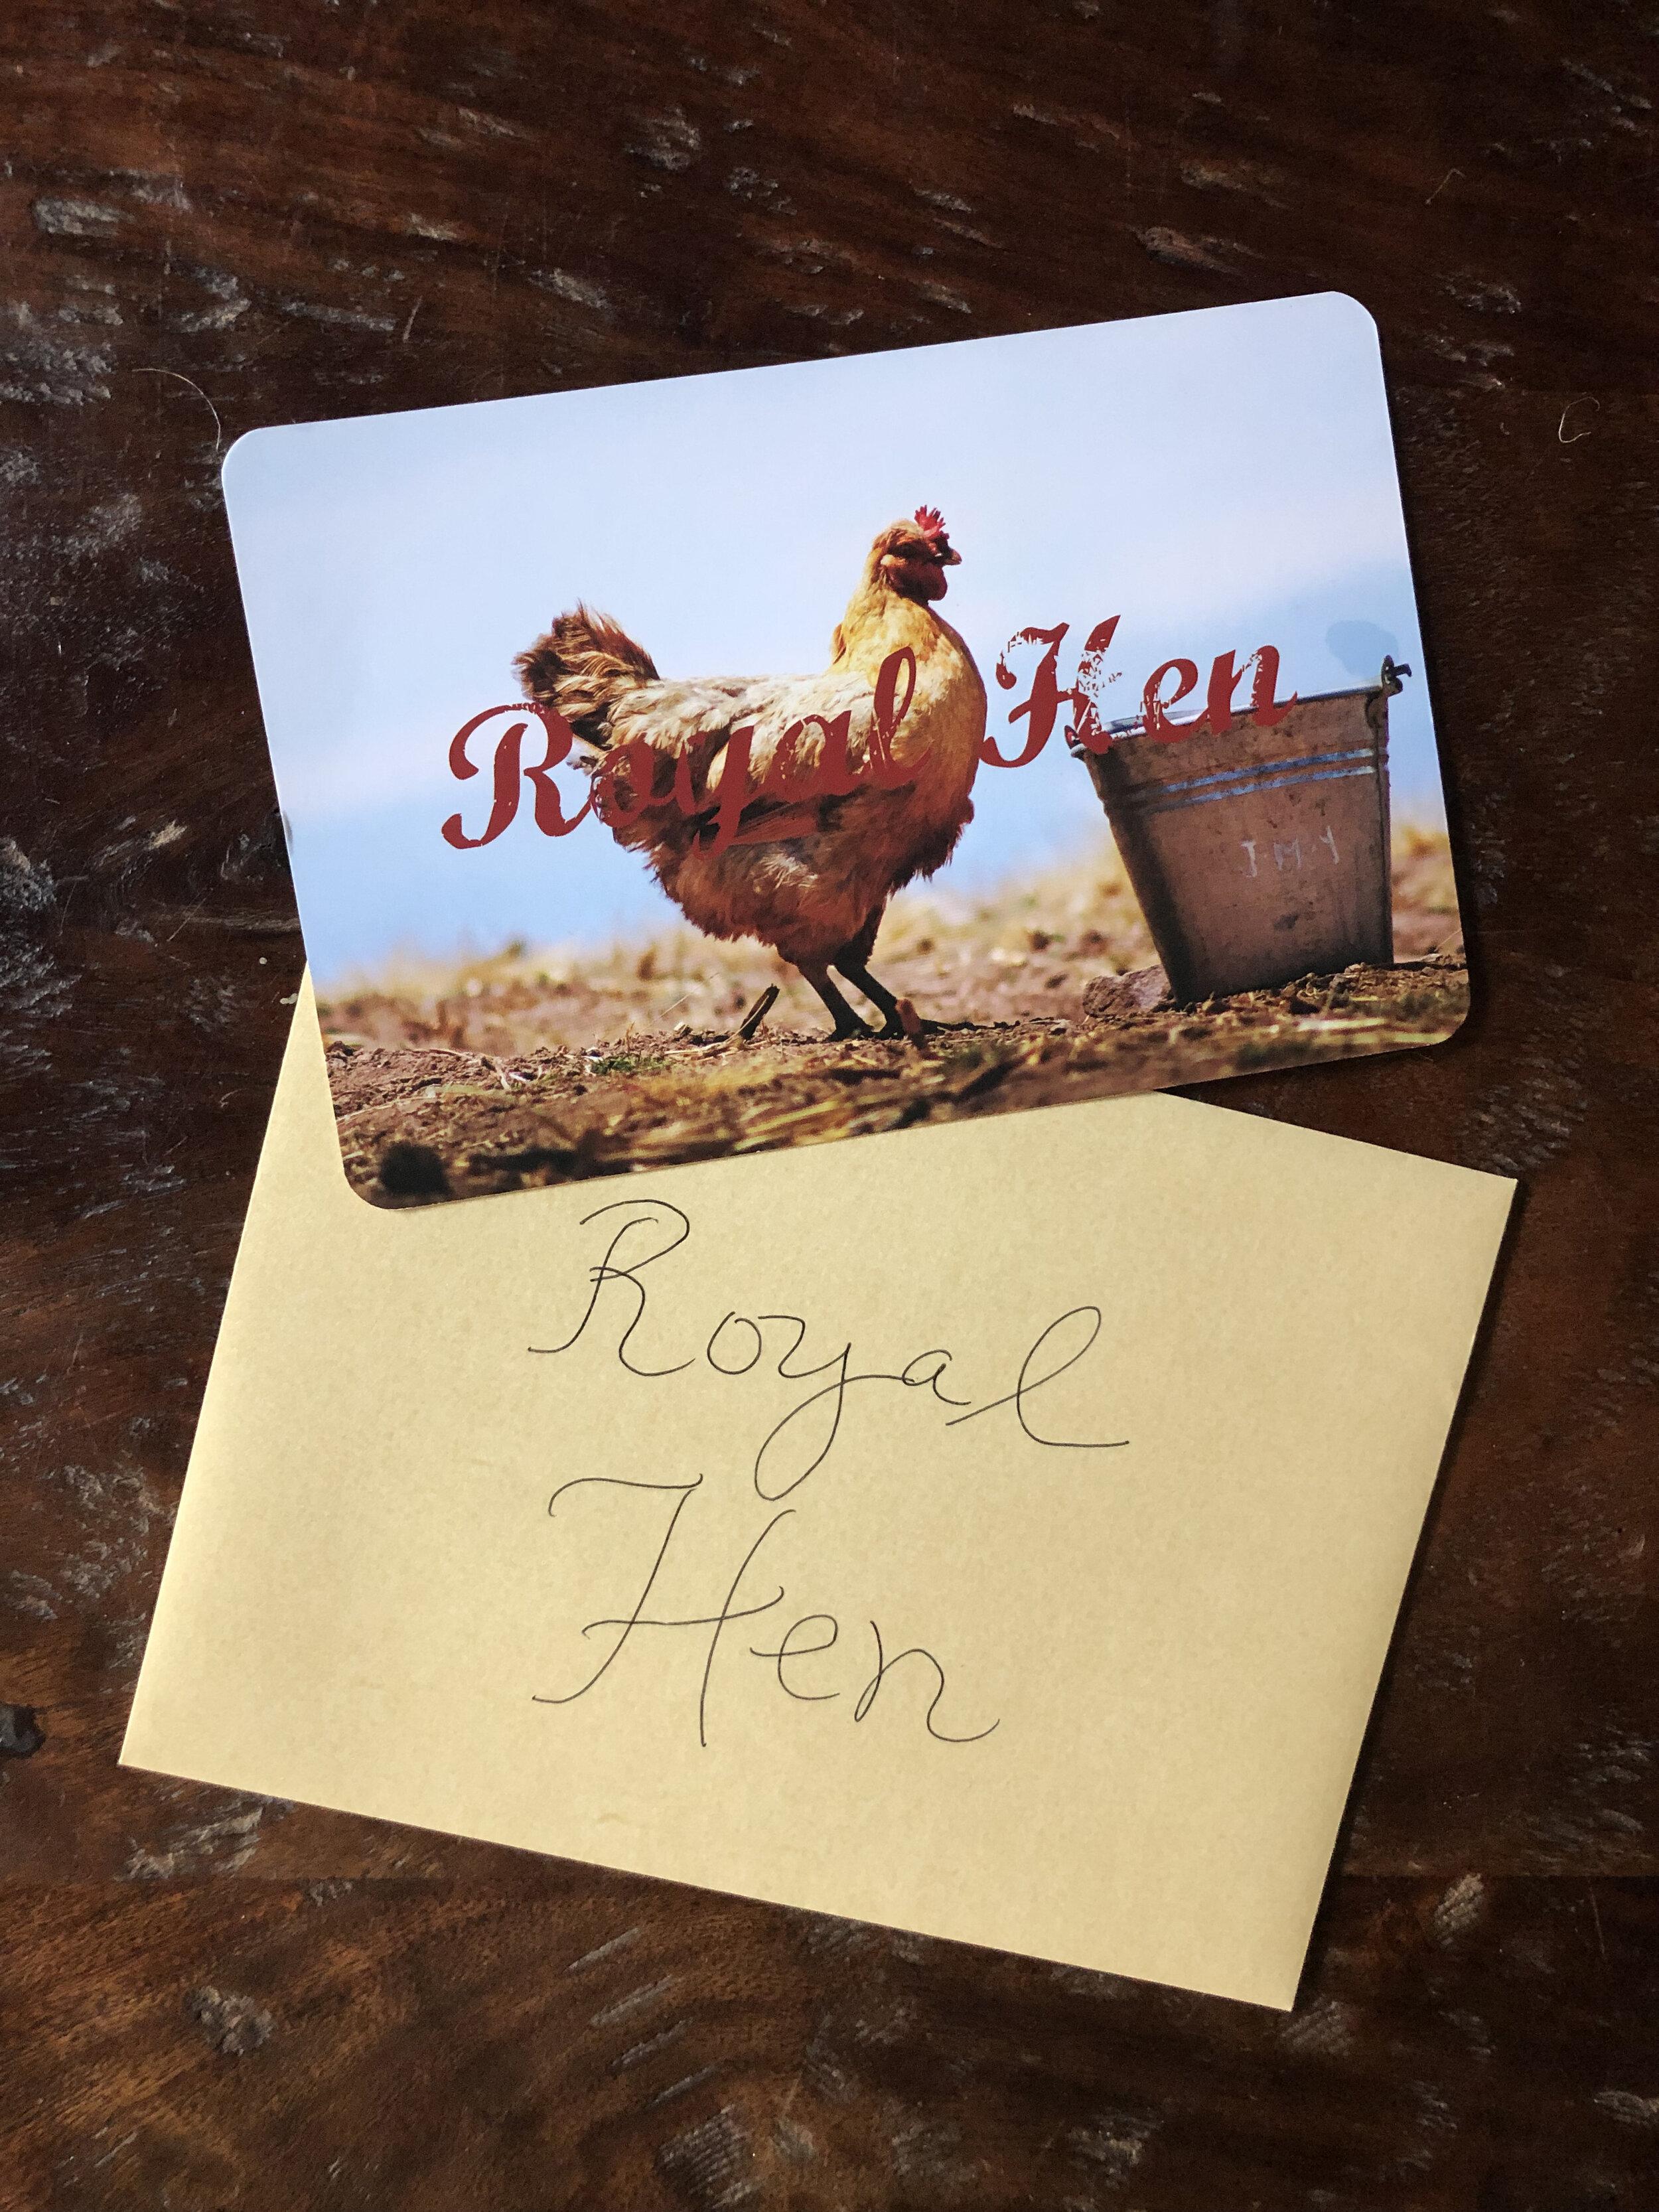 royal hen.jpg